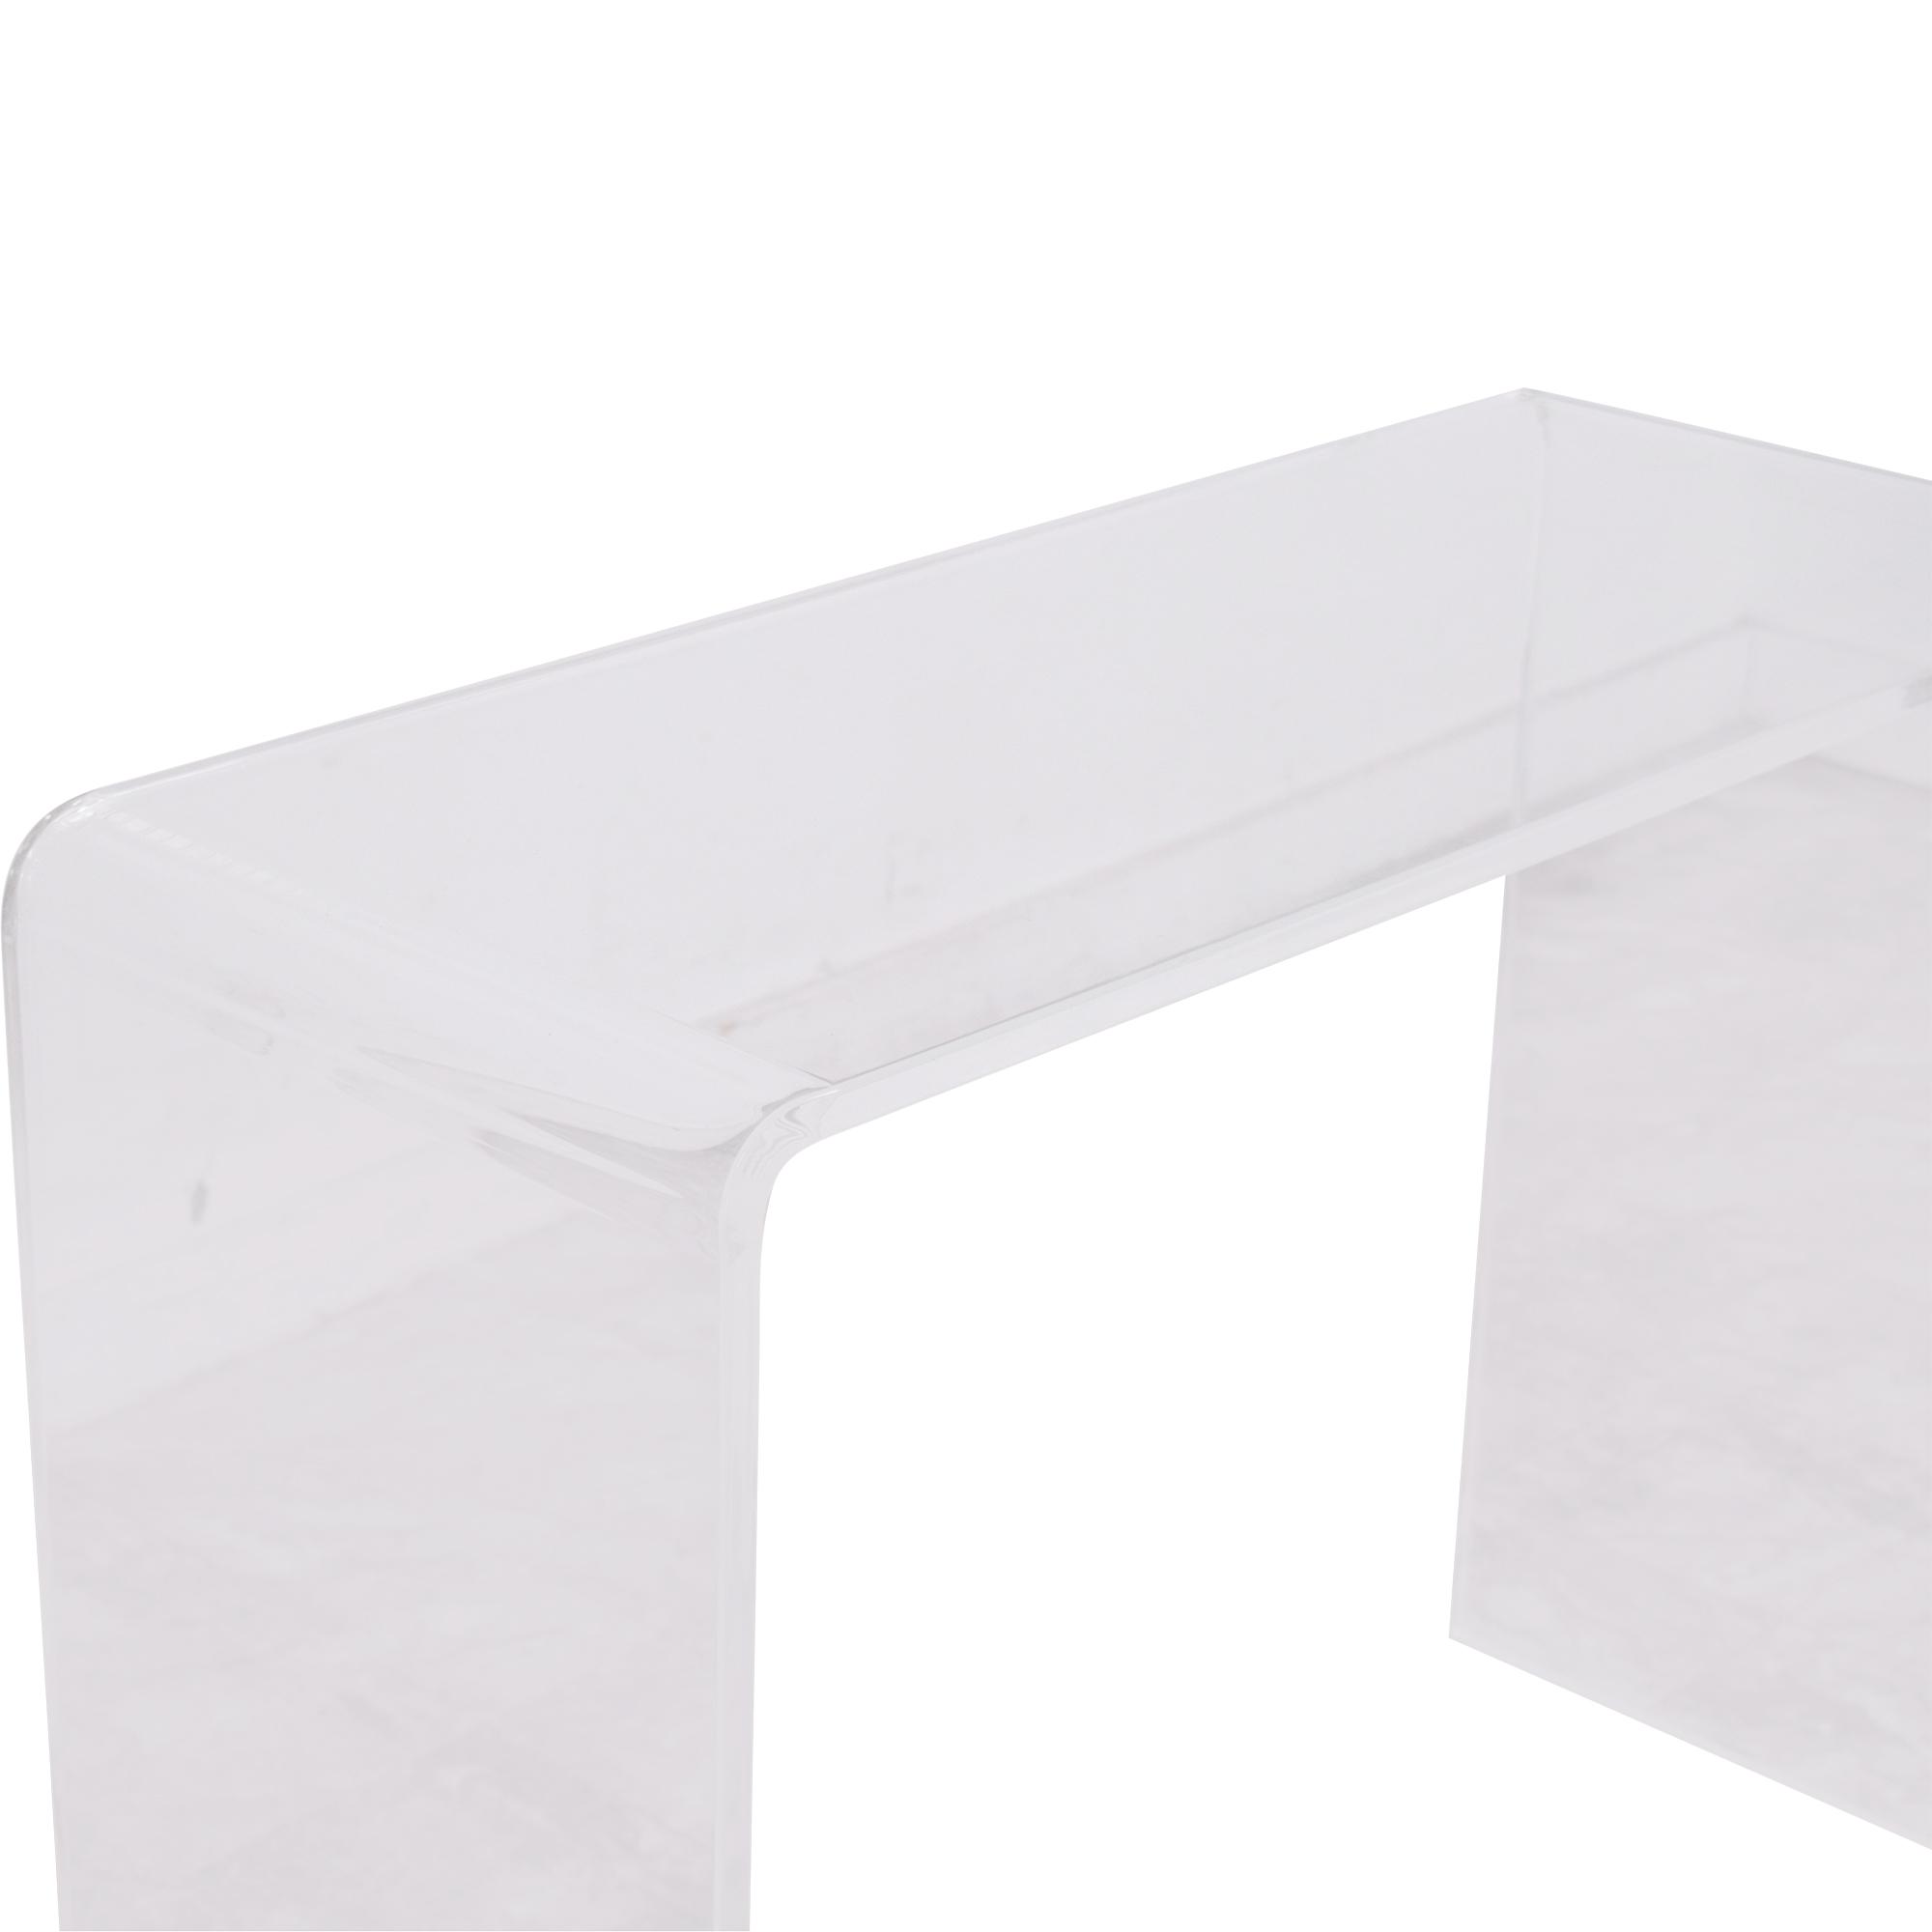 CB2 CB2 Peekaboo Acrylic Console Table discount